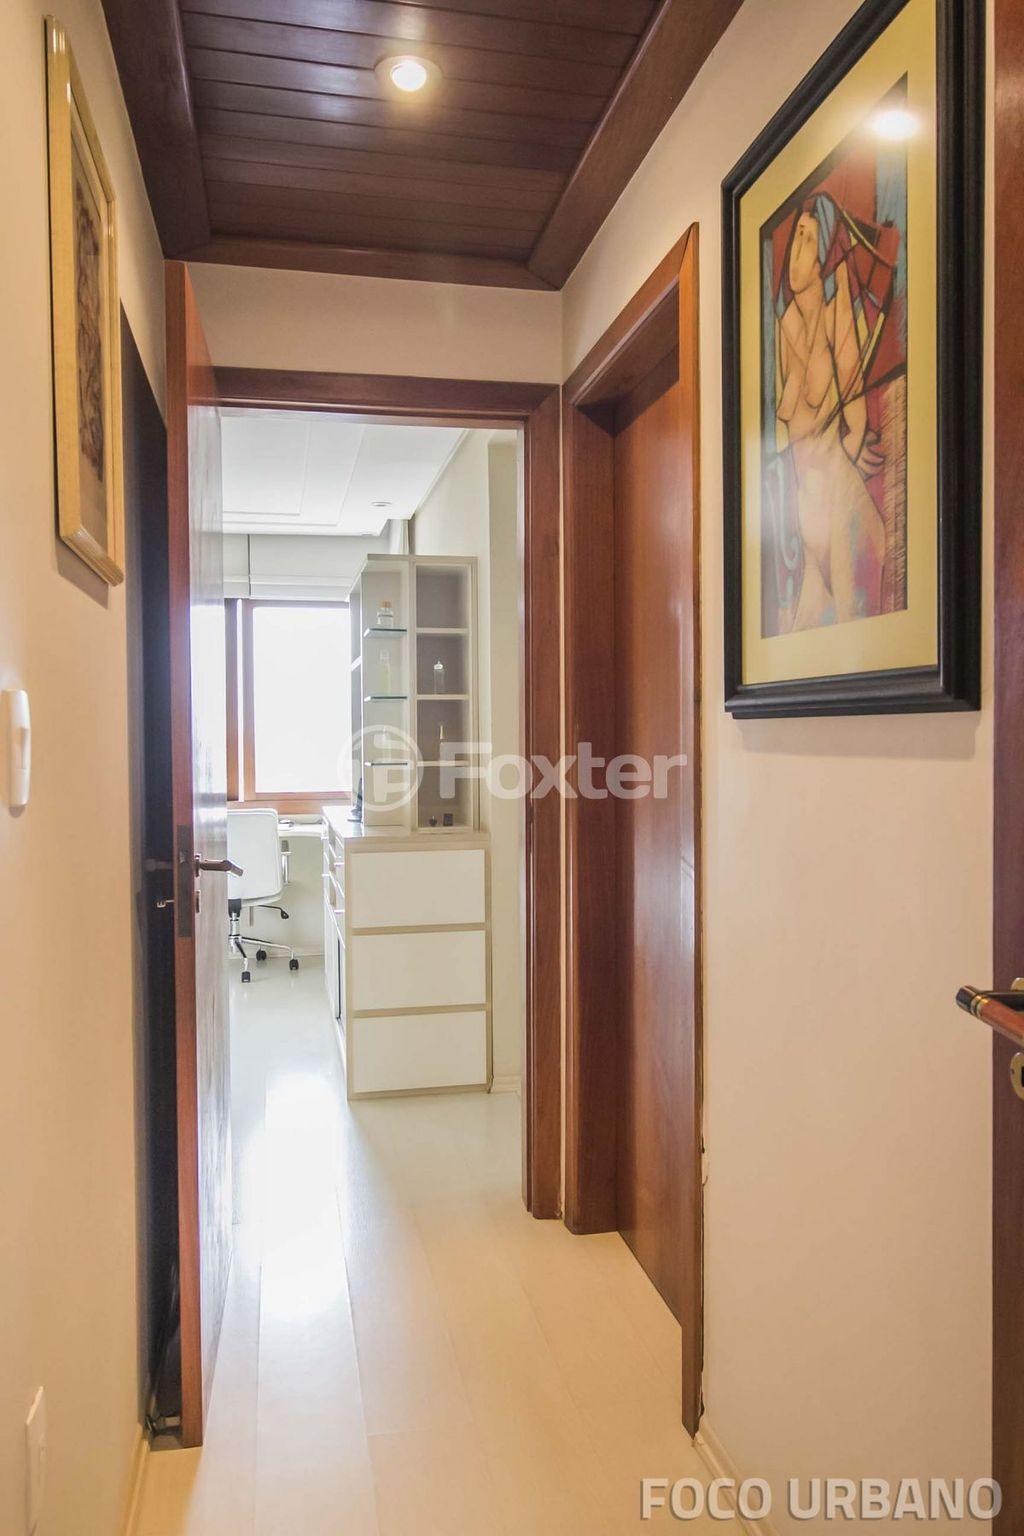 Villa Bella - Cobertura 3 Dorm, Moinhos de Vento, Porto Alegre (8358) - Foto 16